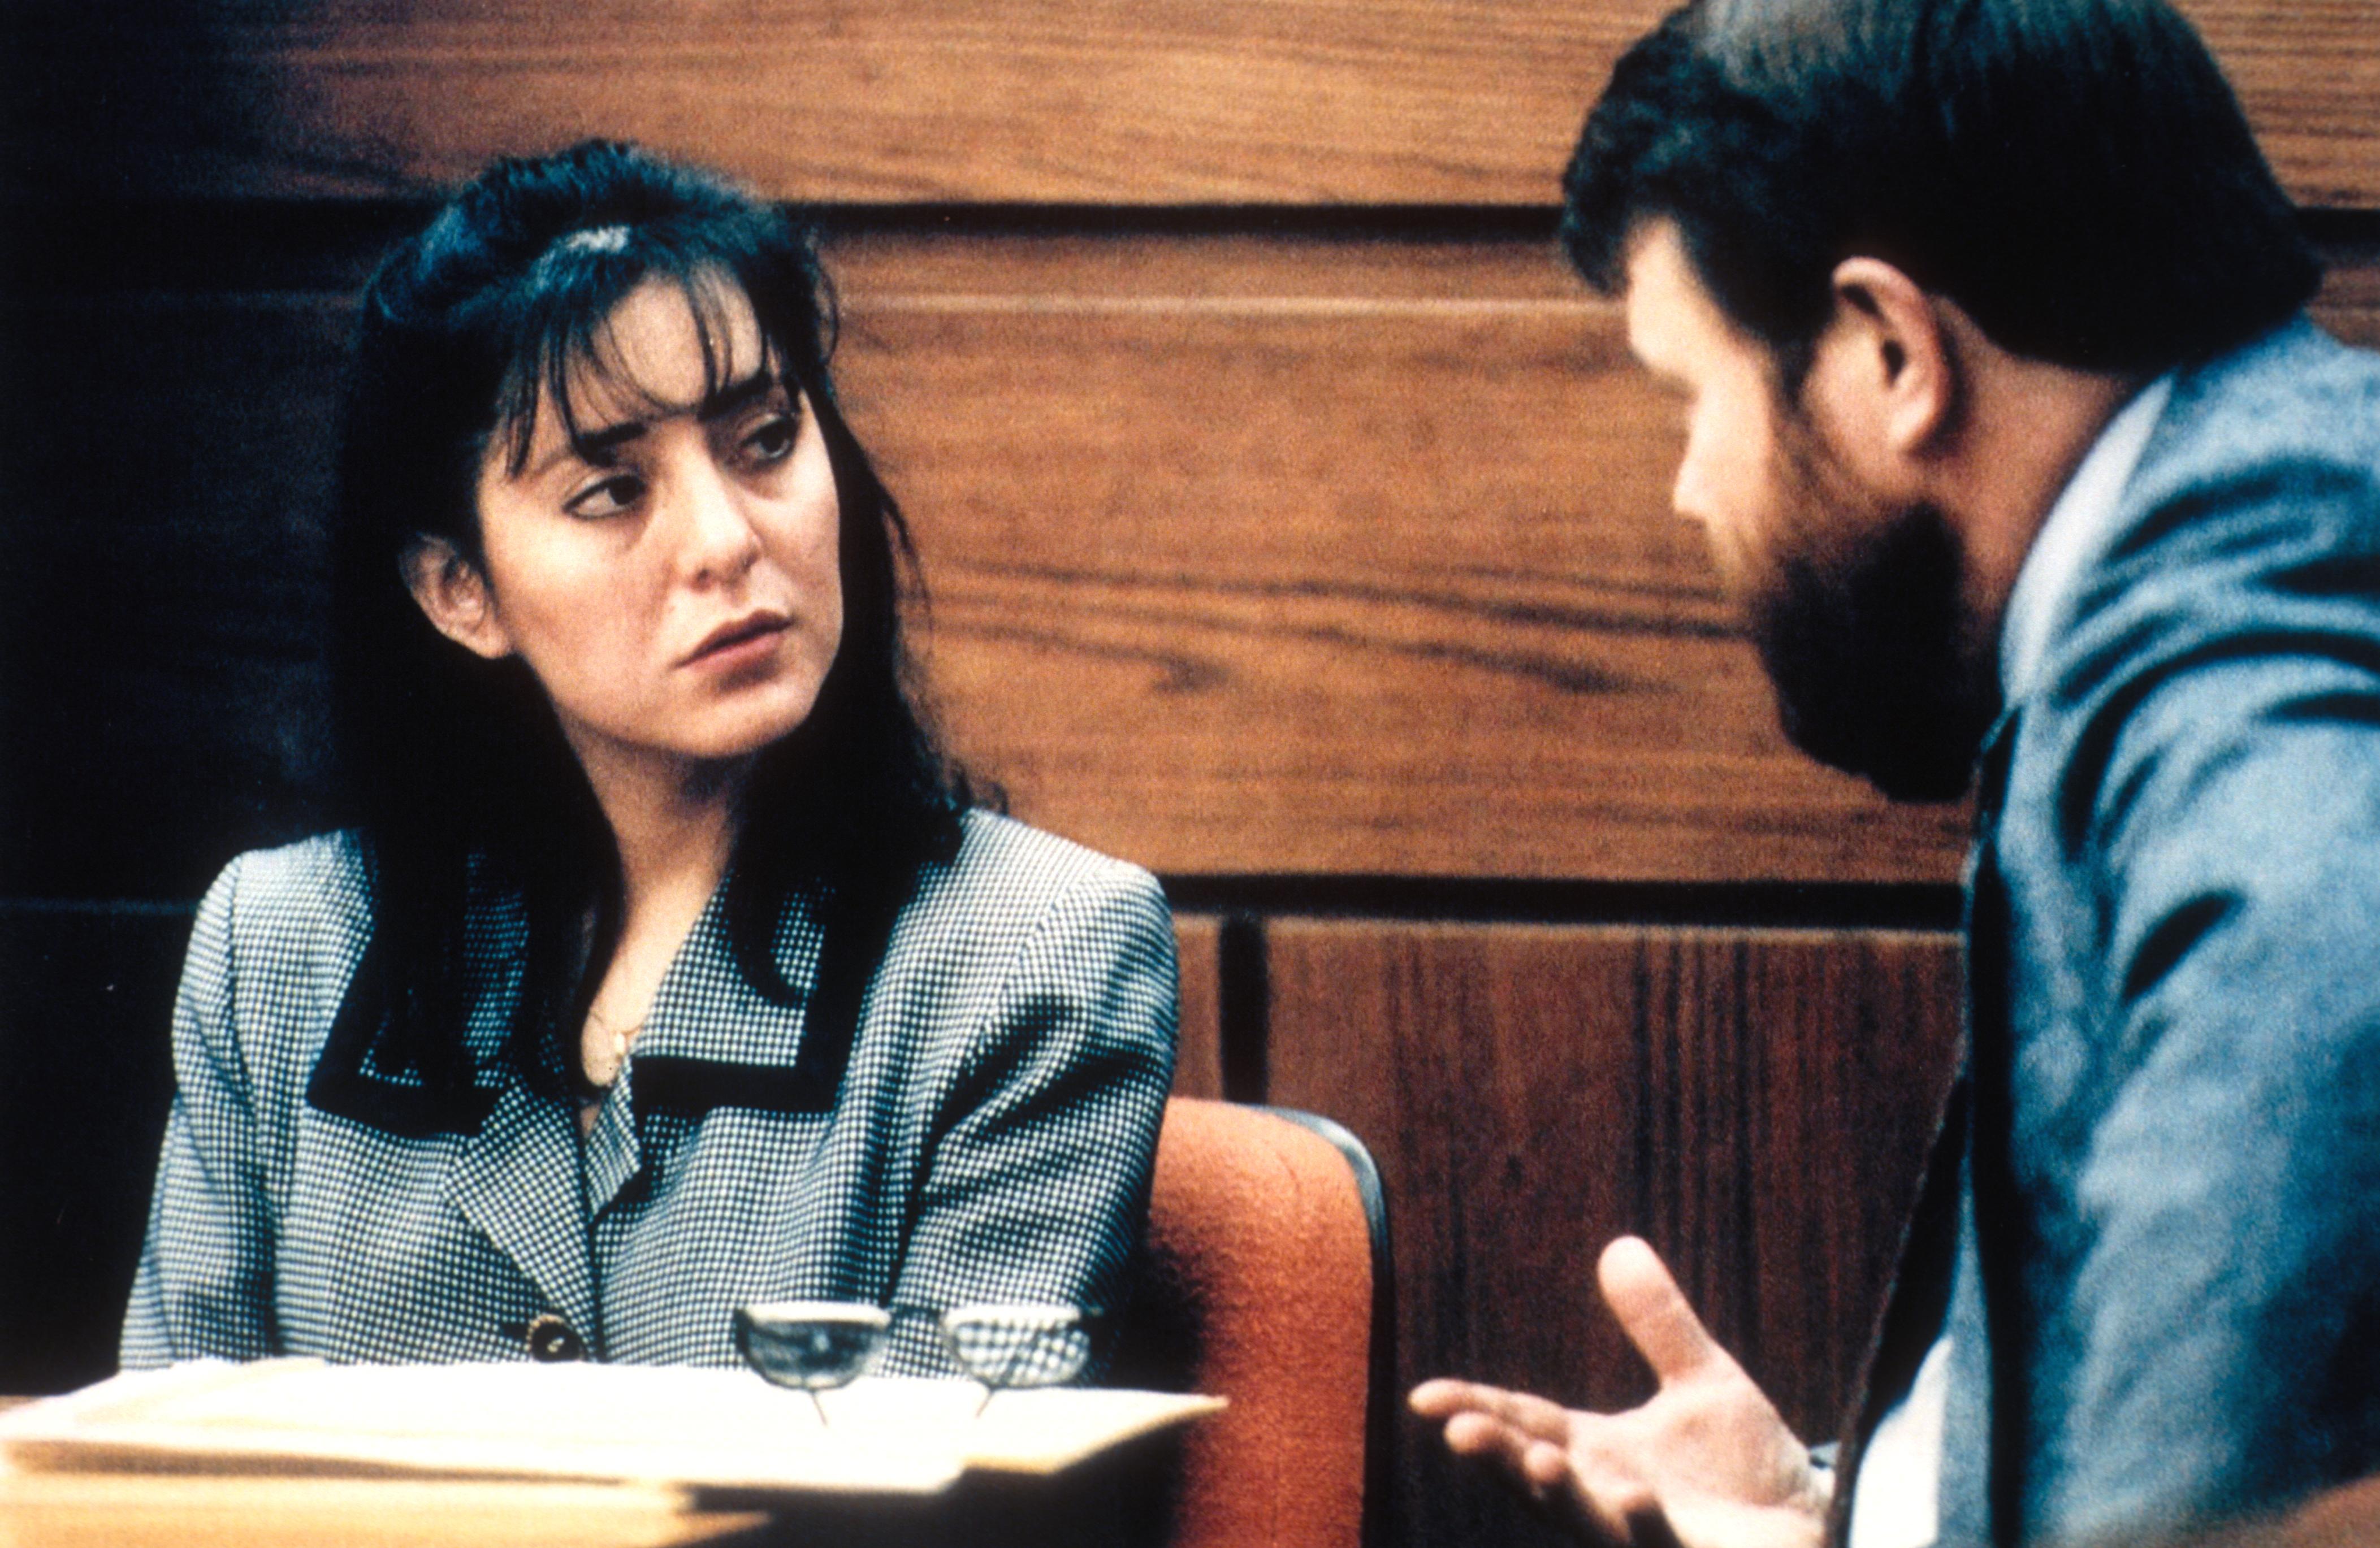 Lorena Bobbitt on Trial in Virginia